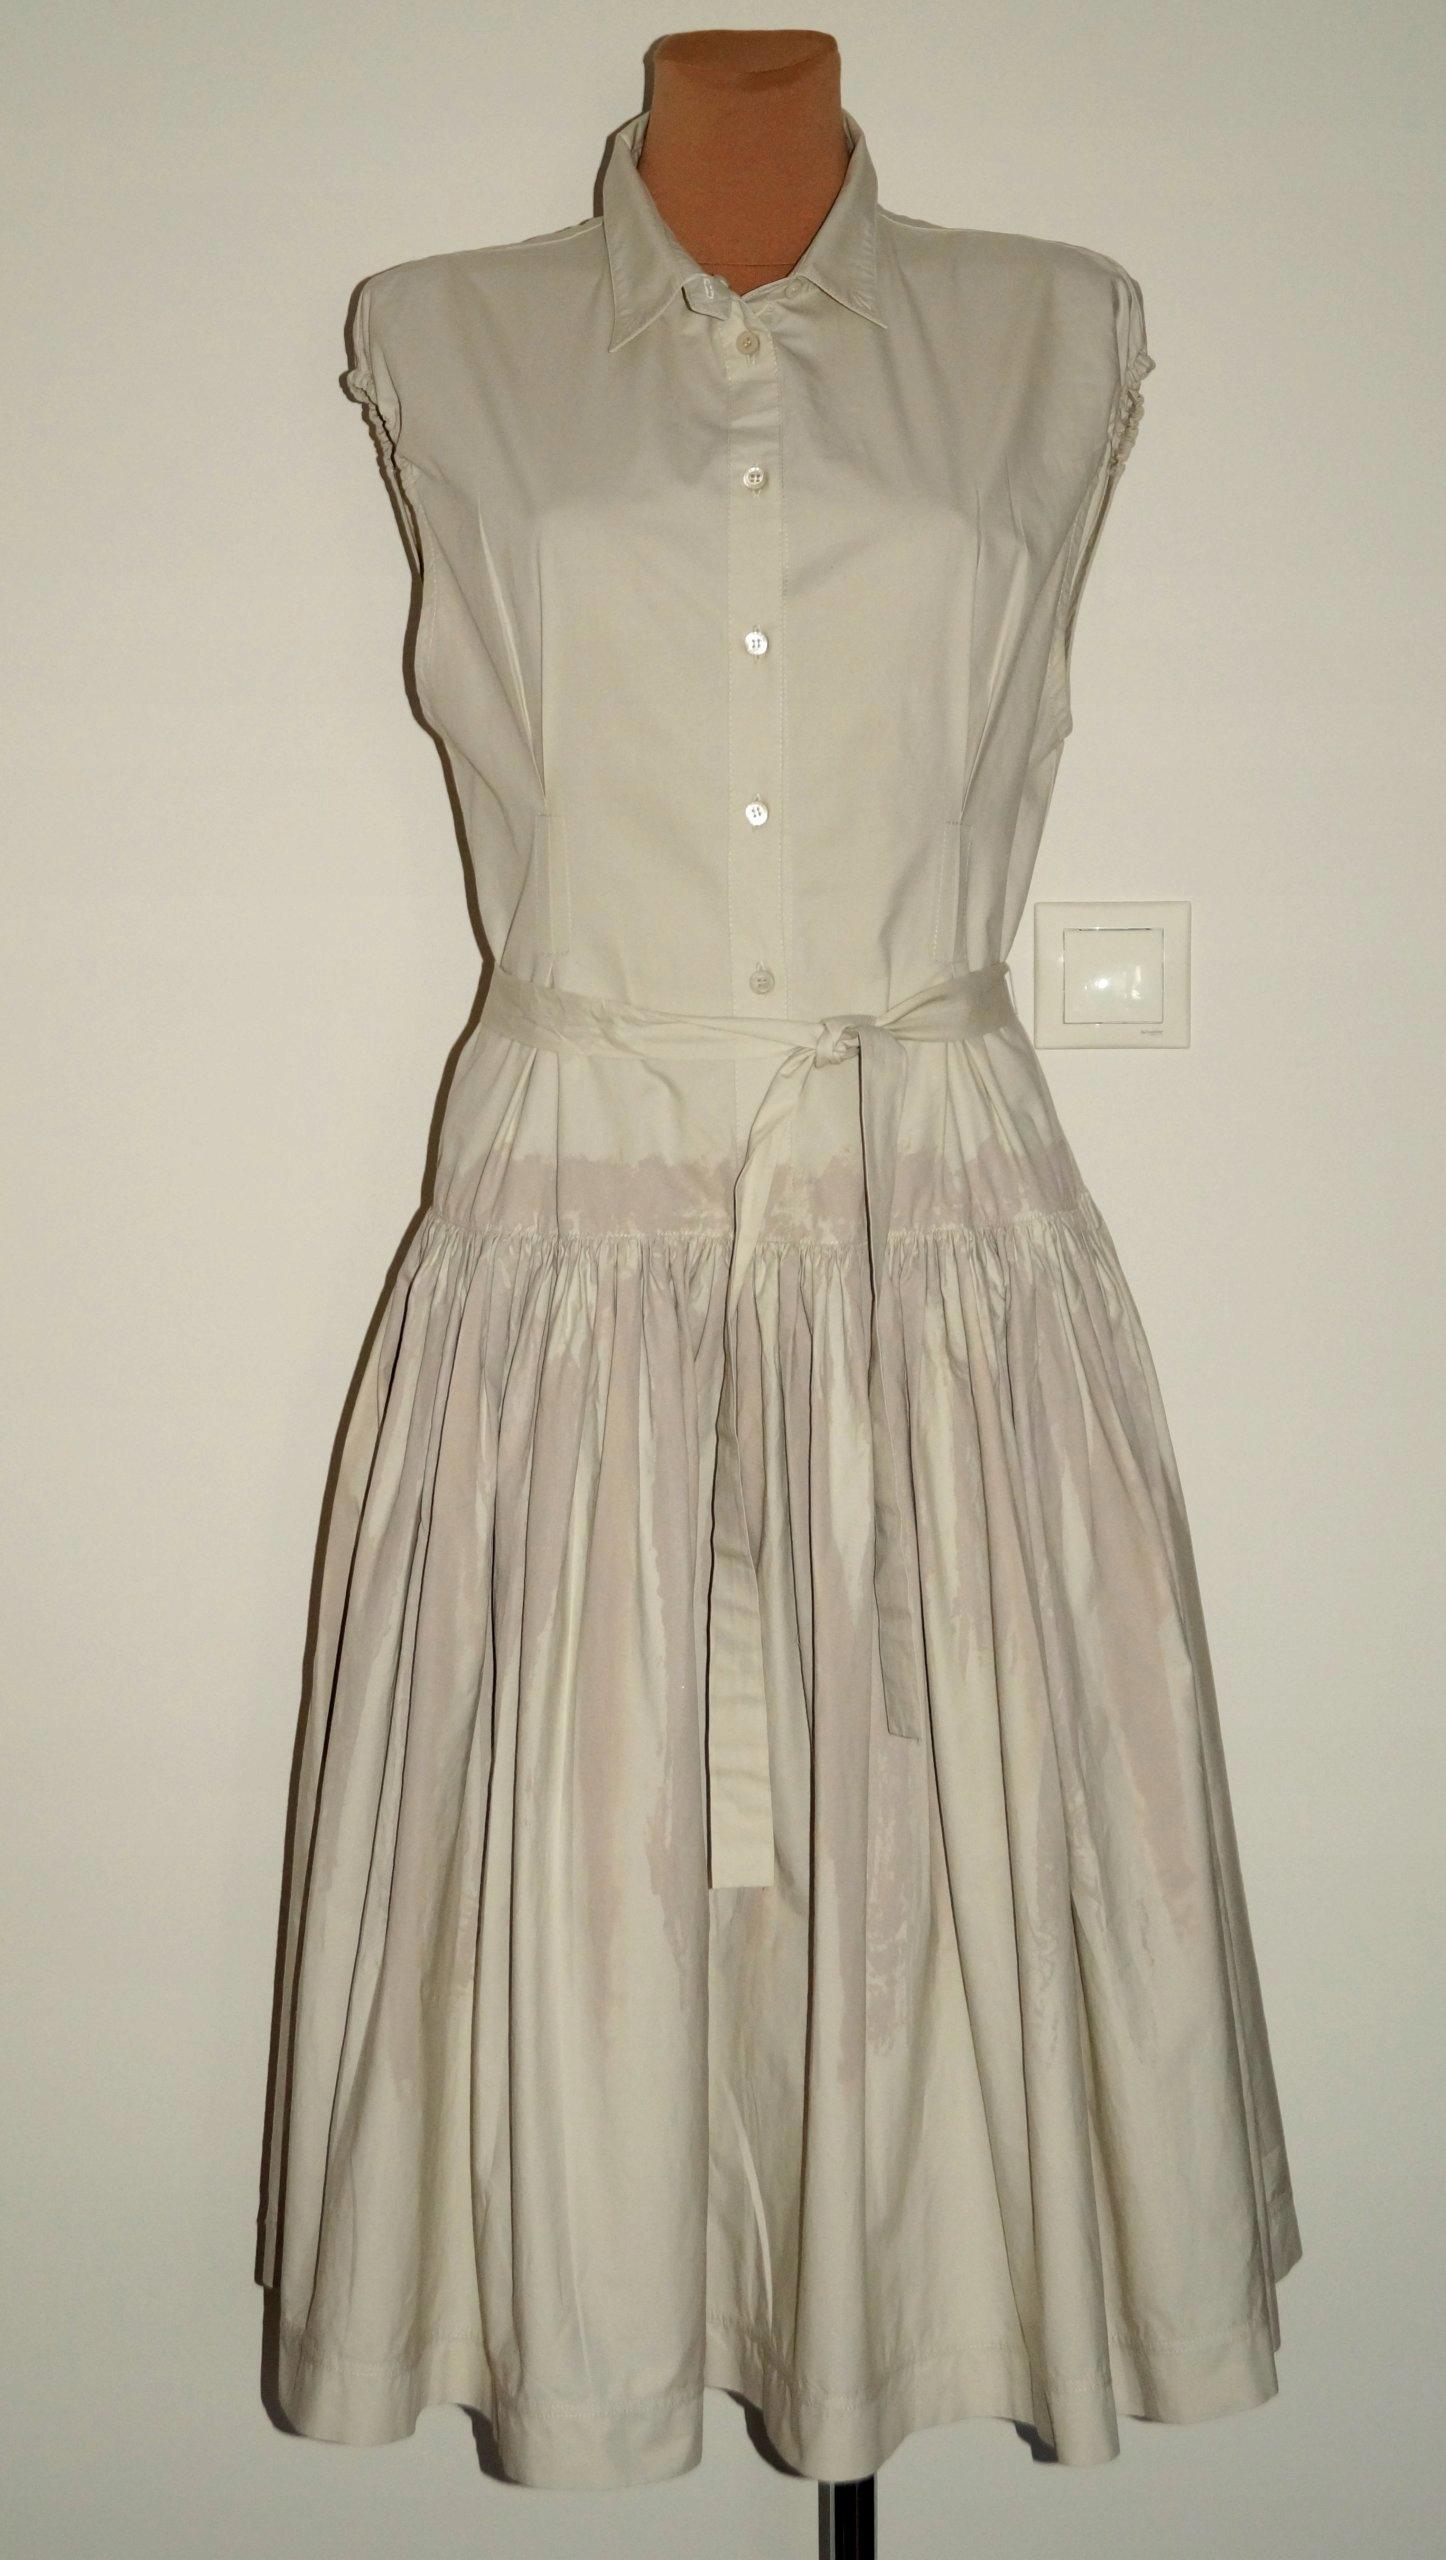 a874aec2f8c85 PRADA MILANO luksus oryginalna sukienka J.NOWA 40 - 7420989747 ...